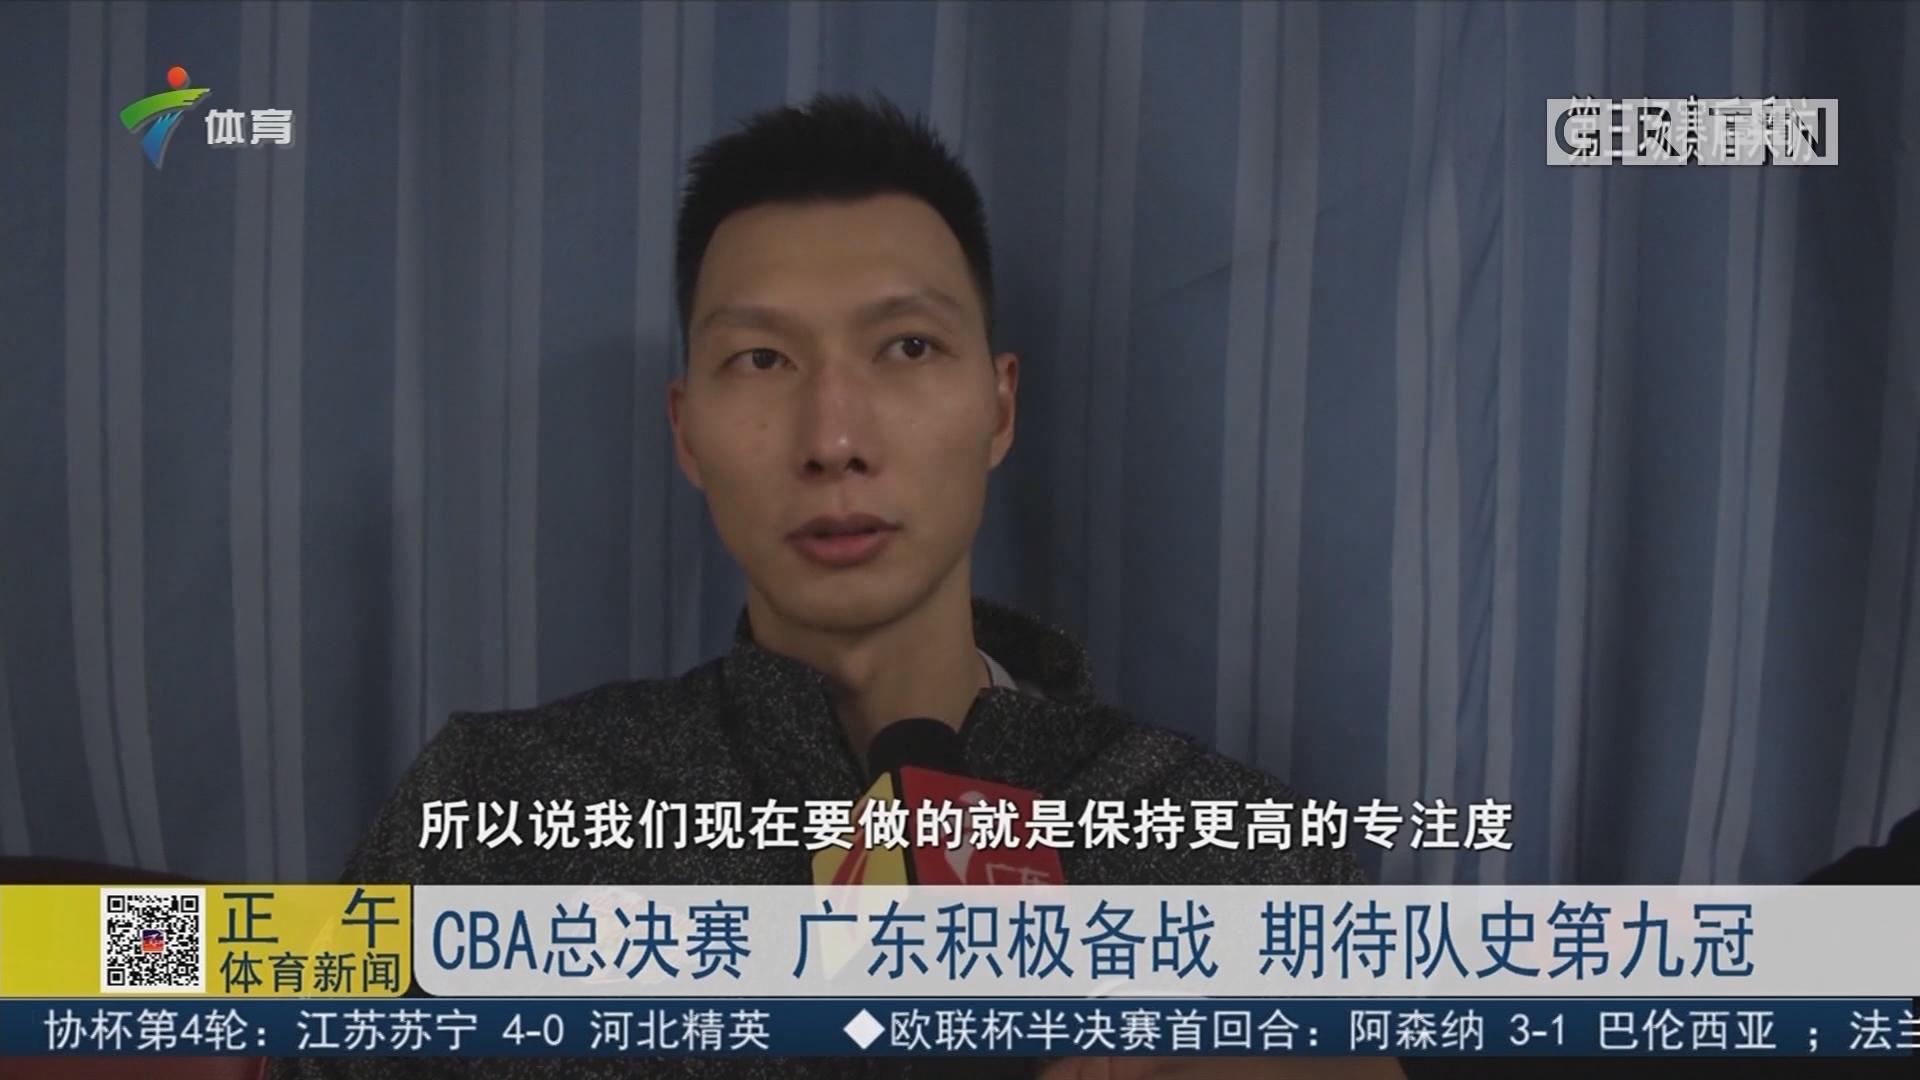 CBA总决赛 广东积极备战 期待队史第九冠